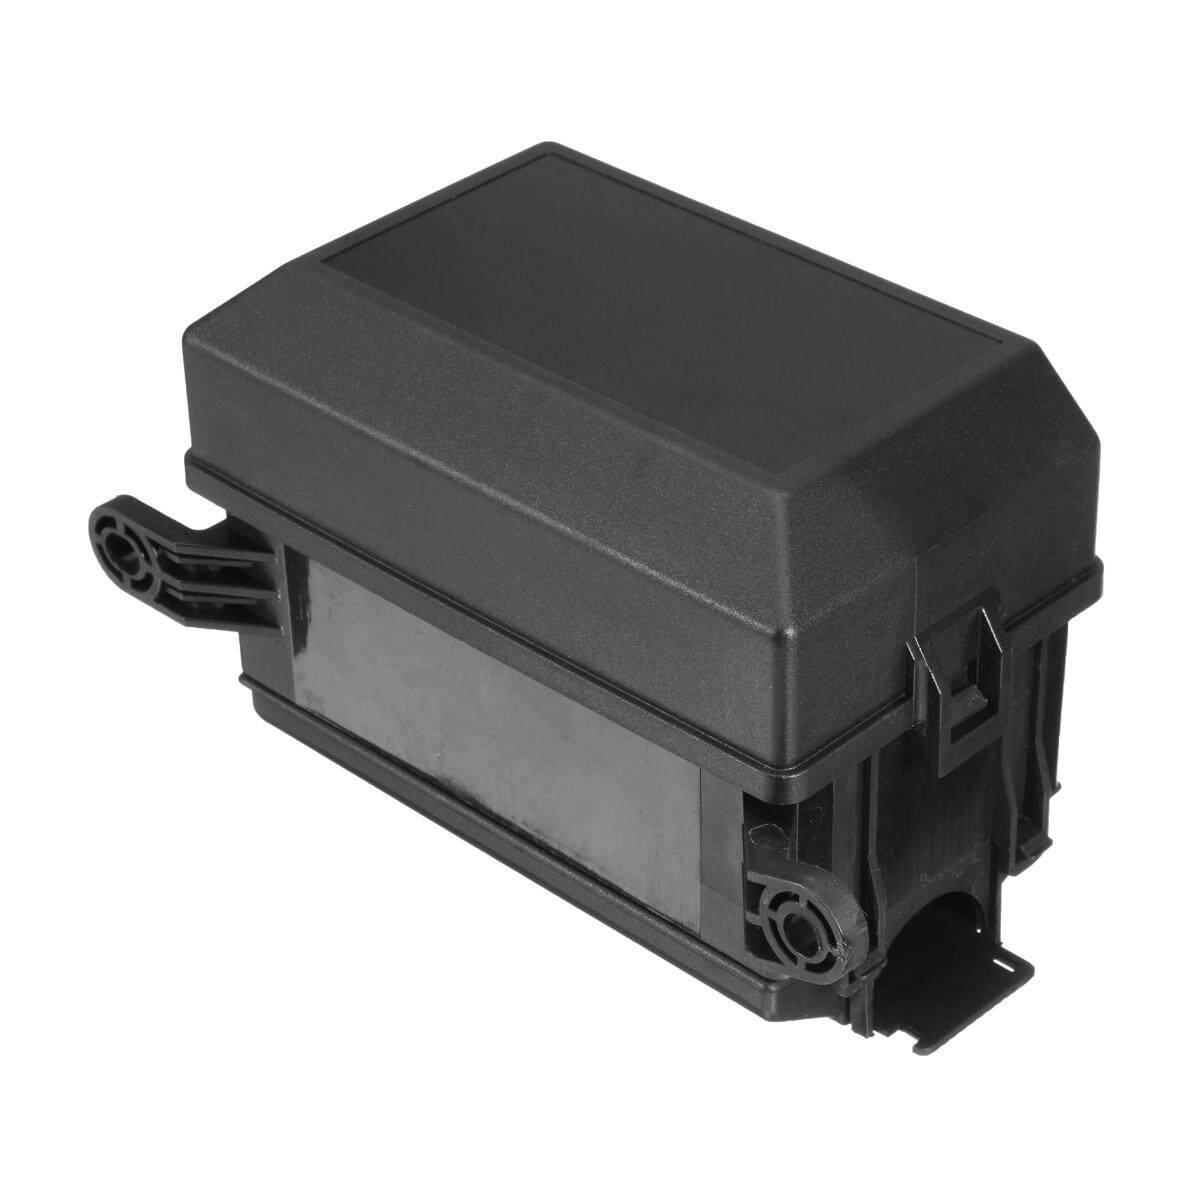 hight resolution of auto car fuse relay holder box relay socket 6 relay 6 atc ato fuses universal